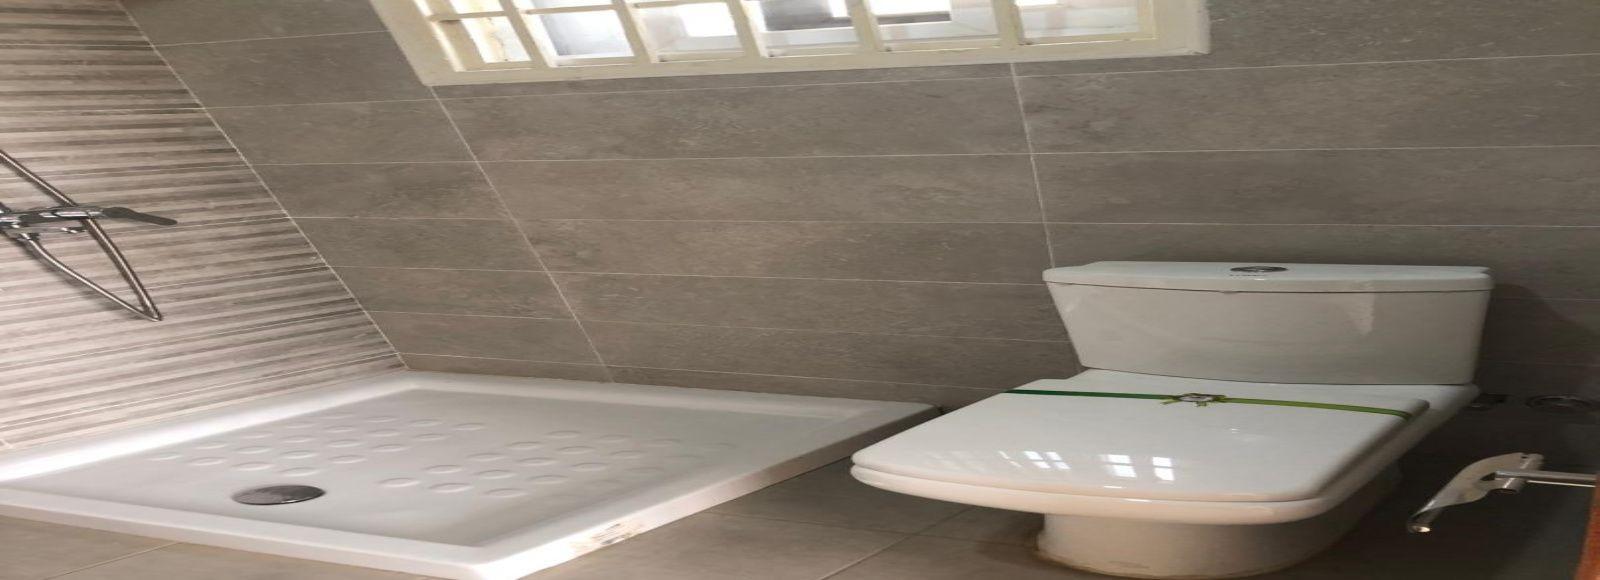 3 Bedroom House For Rent Sakumono Eban Solutions Ghana